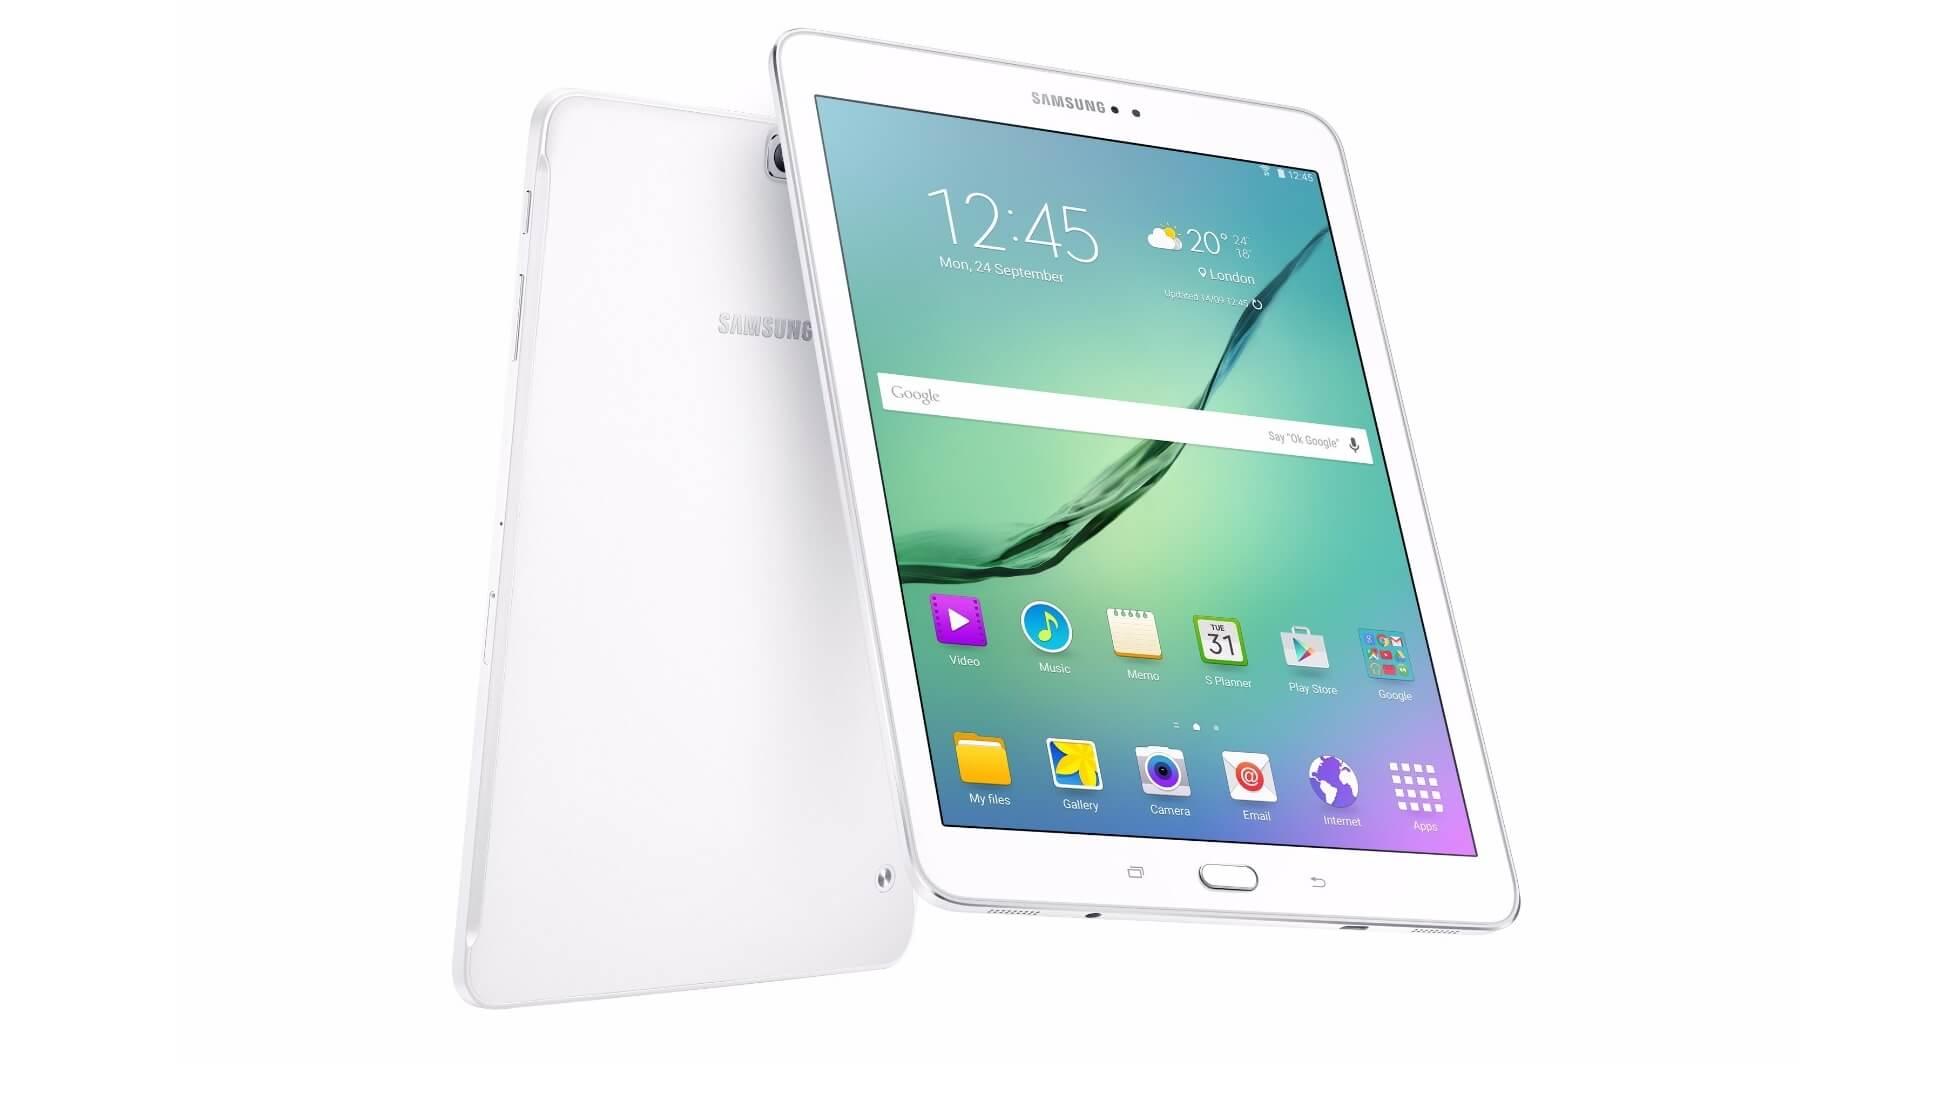 Glomorous Hdmi Mini Tablet Samsung Galaxy Tab A Tablet Hdmi Lead Cable Samsung Galaxy Tab A Tablet Hdmi Lead Cable Home Tablet Usb Hdmi dpreview Tablet With Hdmi